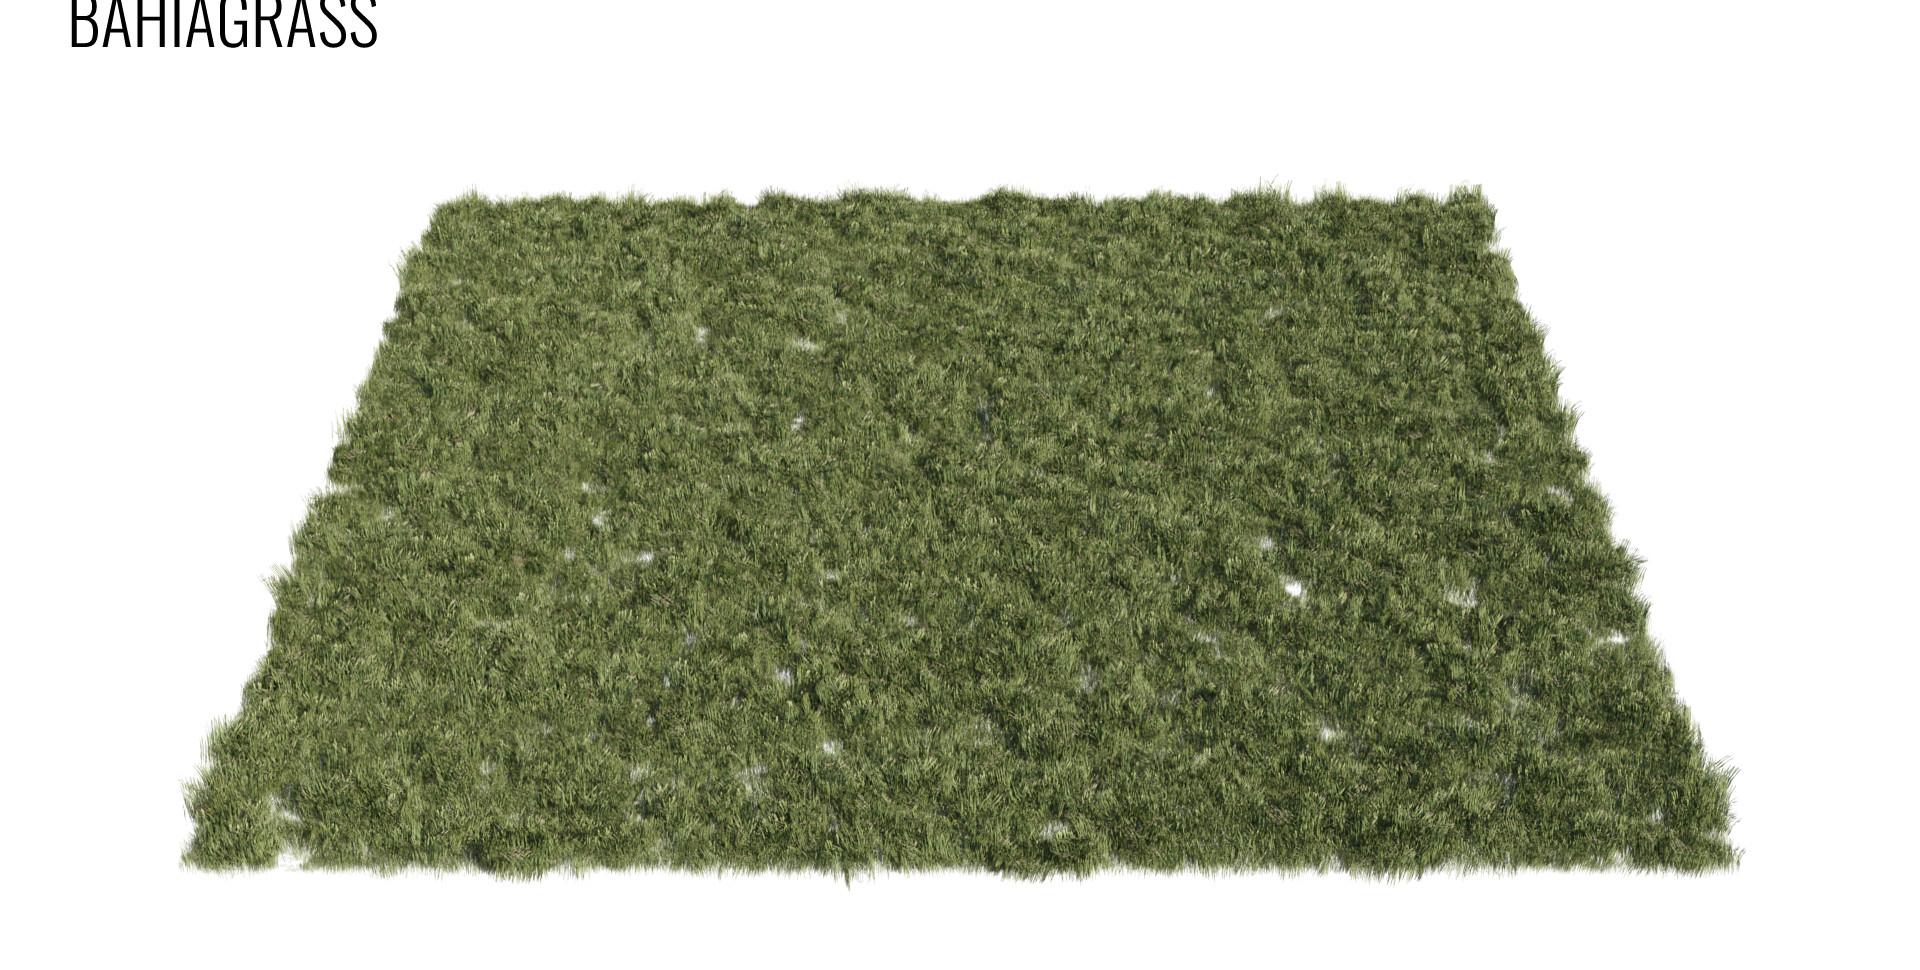 Bahiagrass.jpg